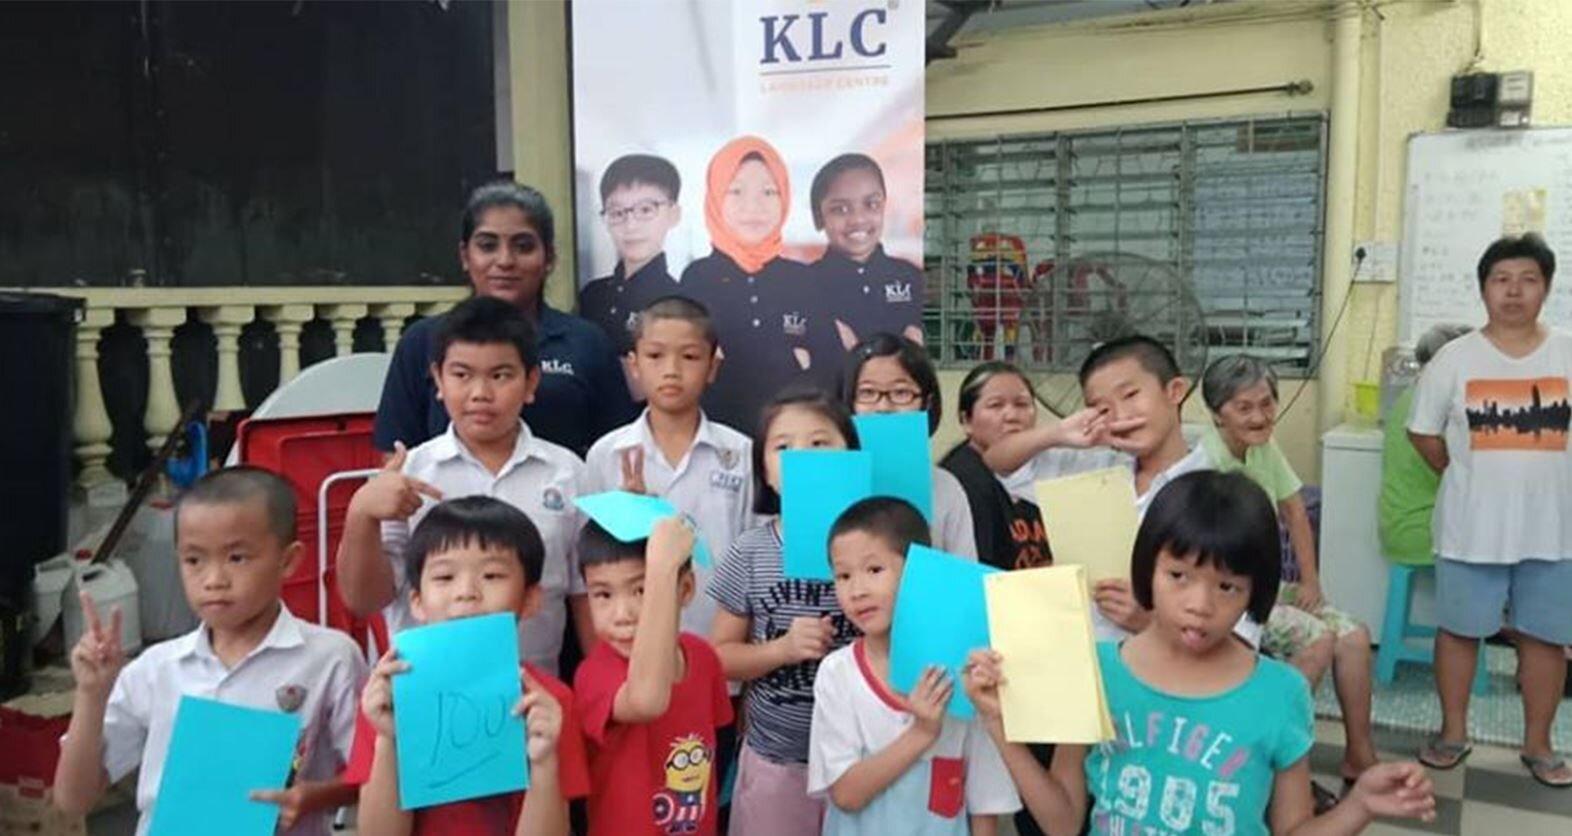 Puchong 喜乐之家慈善活动